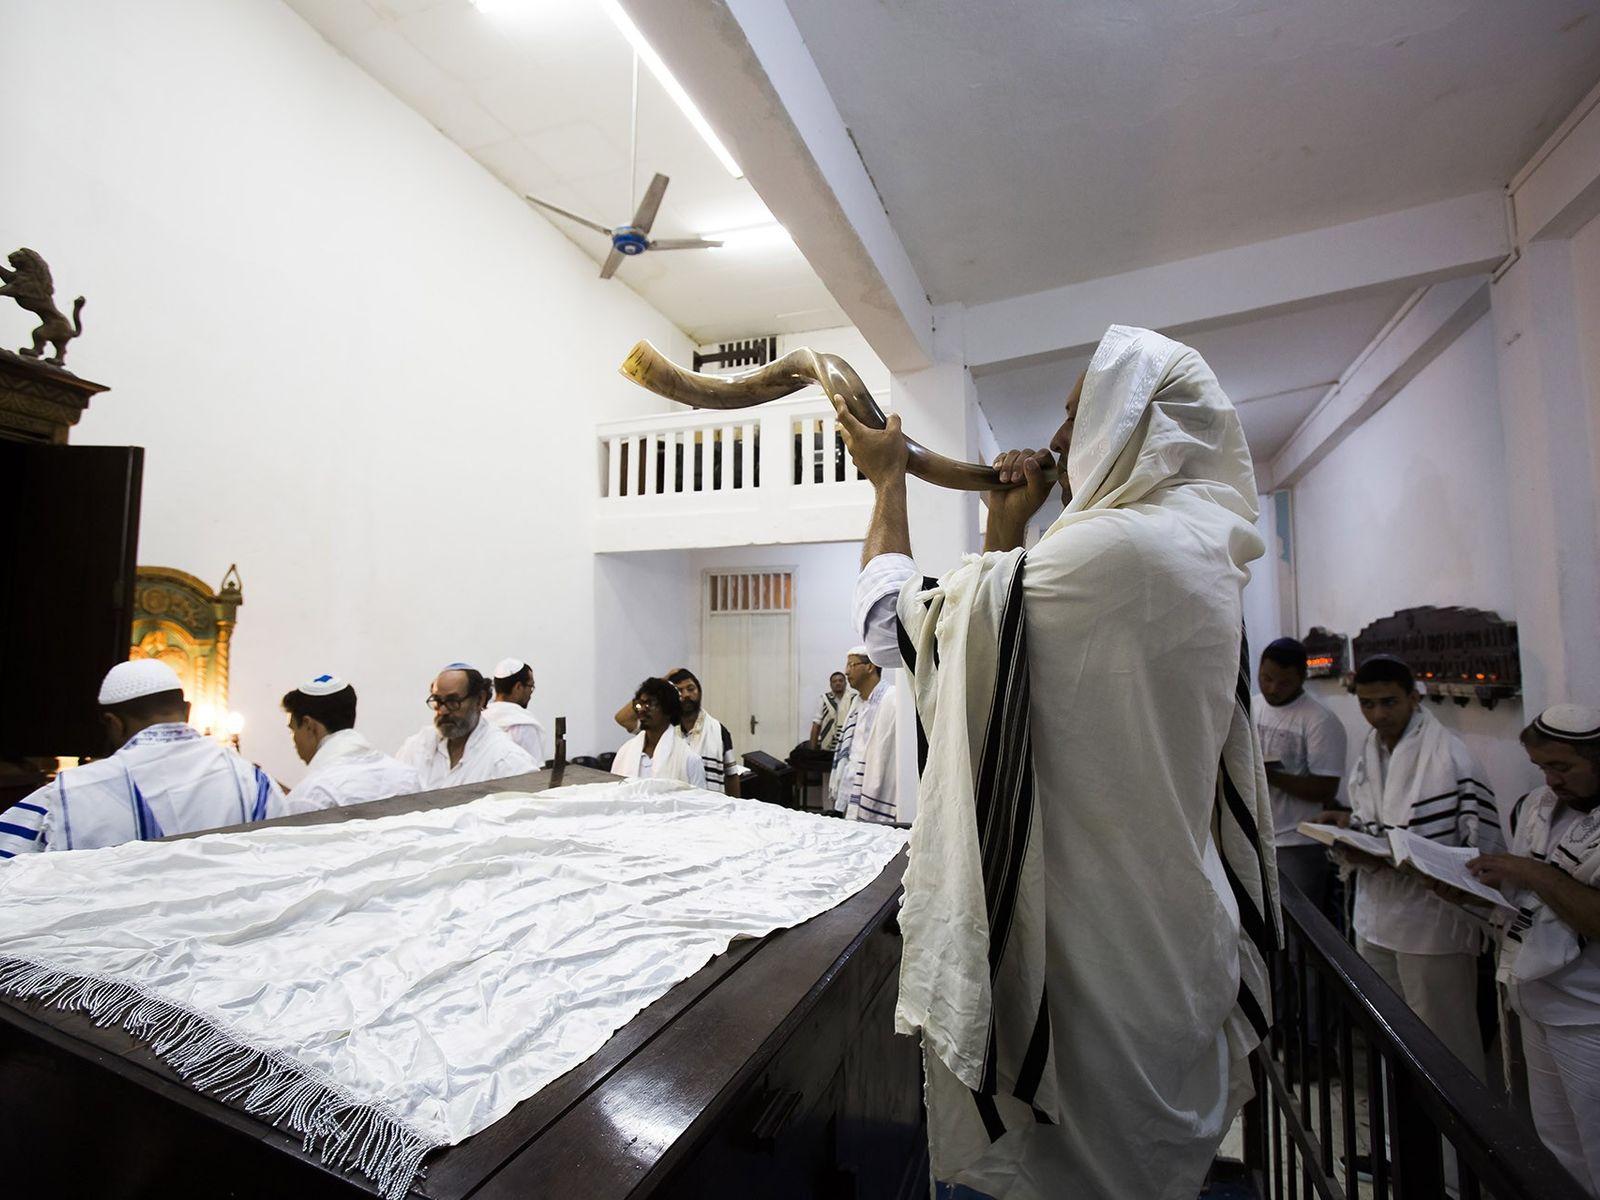 sinagoga-recfe-judeus-do-sertao